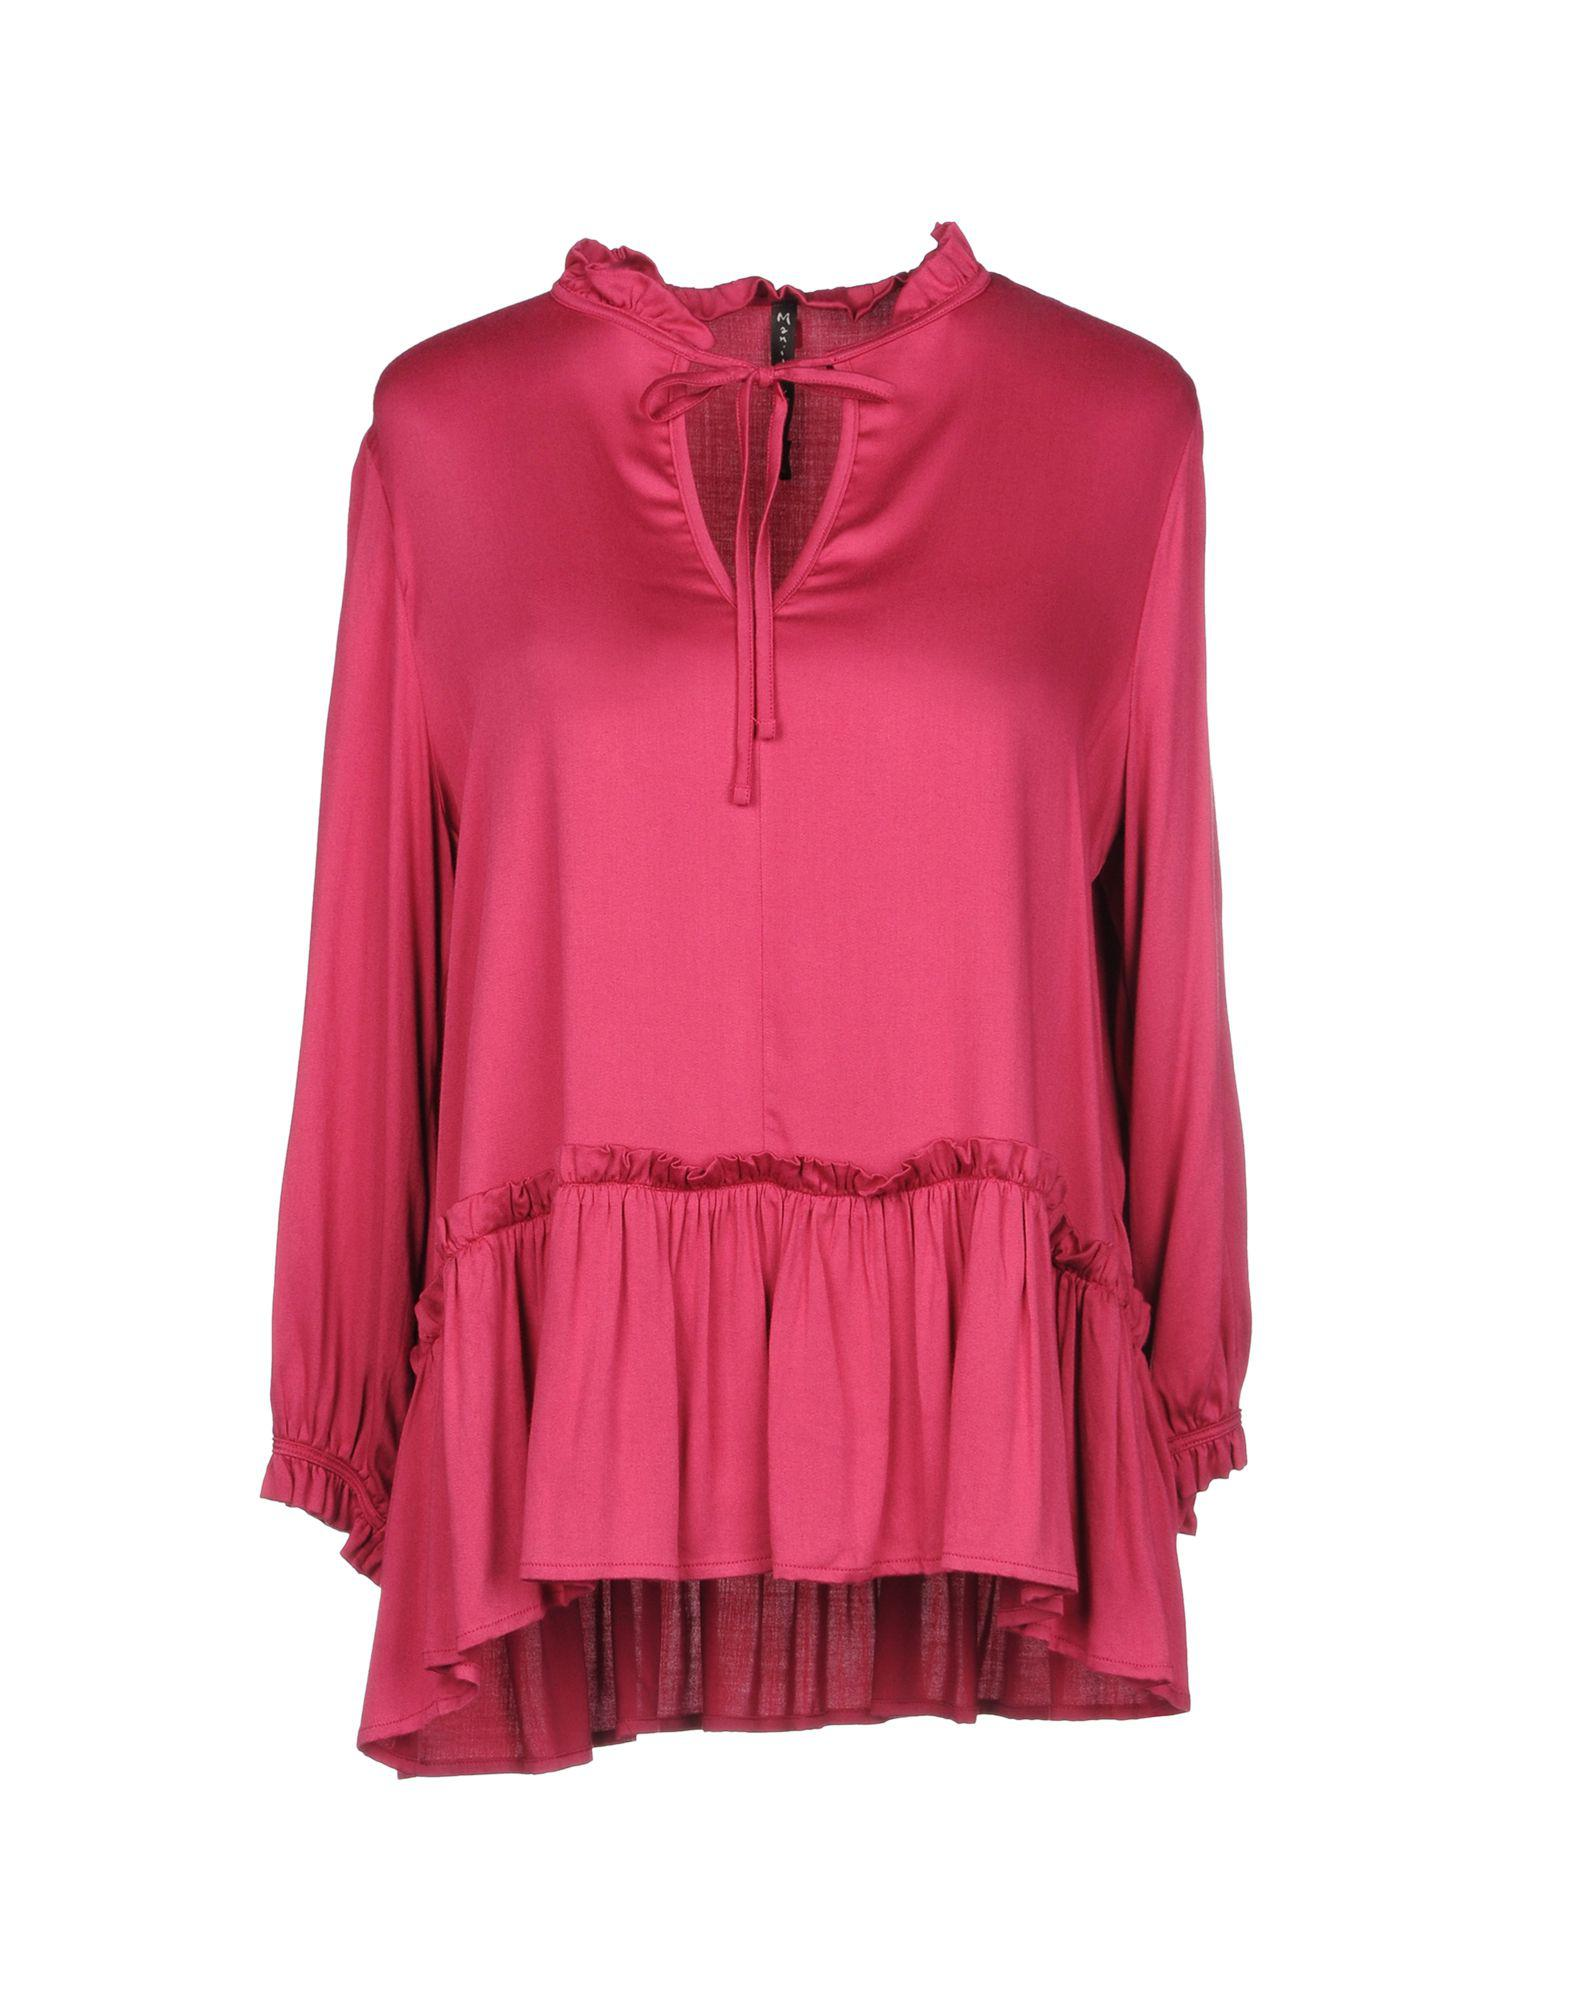 0407d11c2d548 Lyst - Manila Grace Blouse in Pink